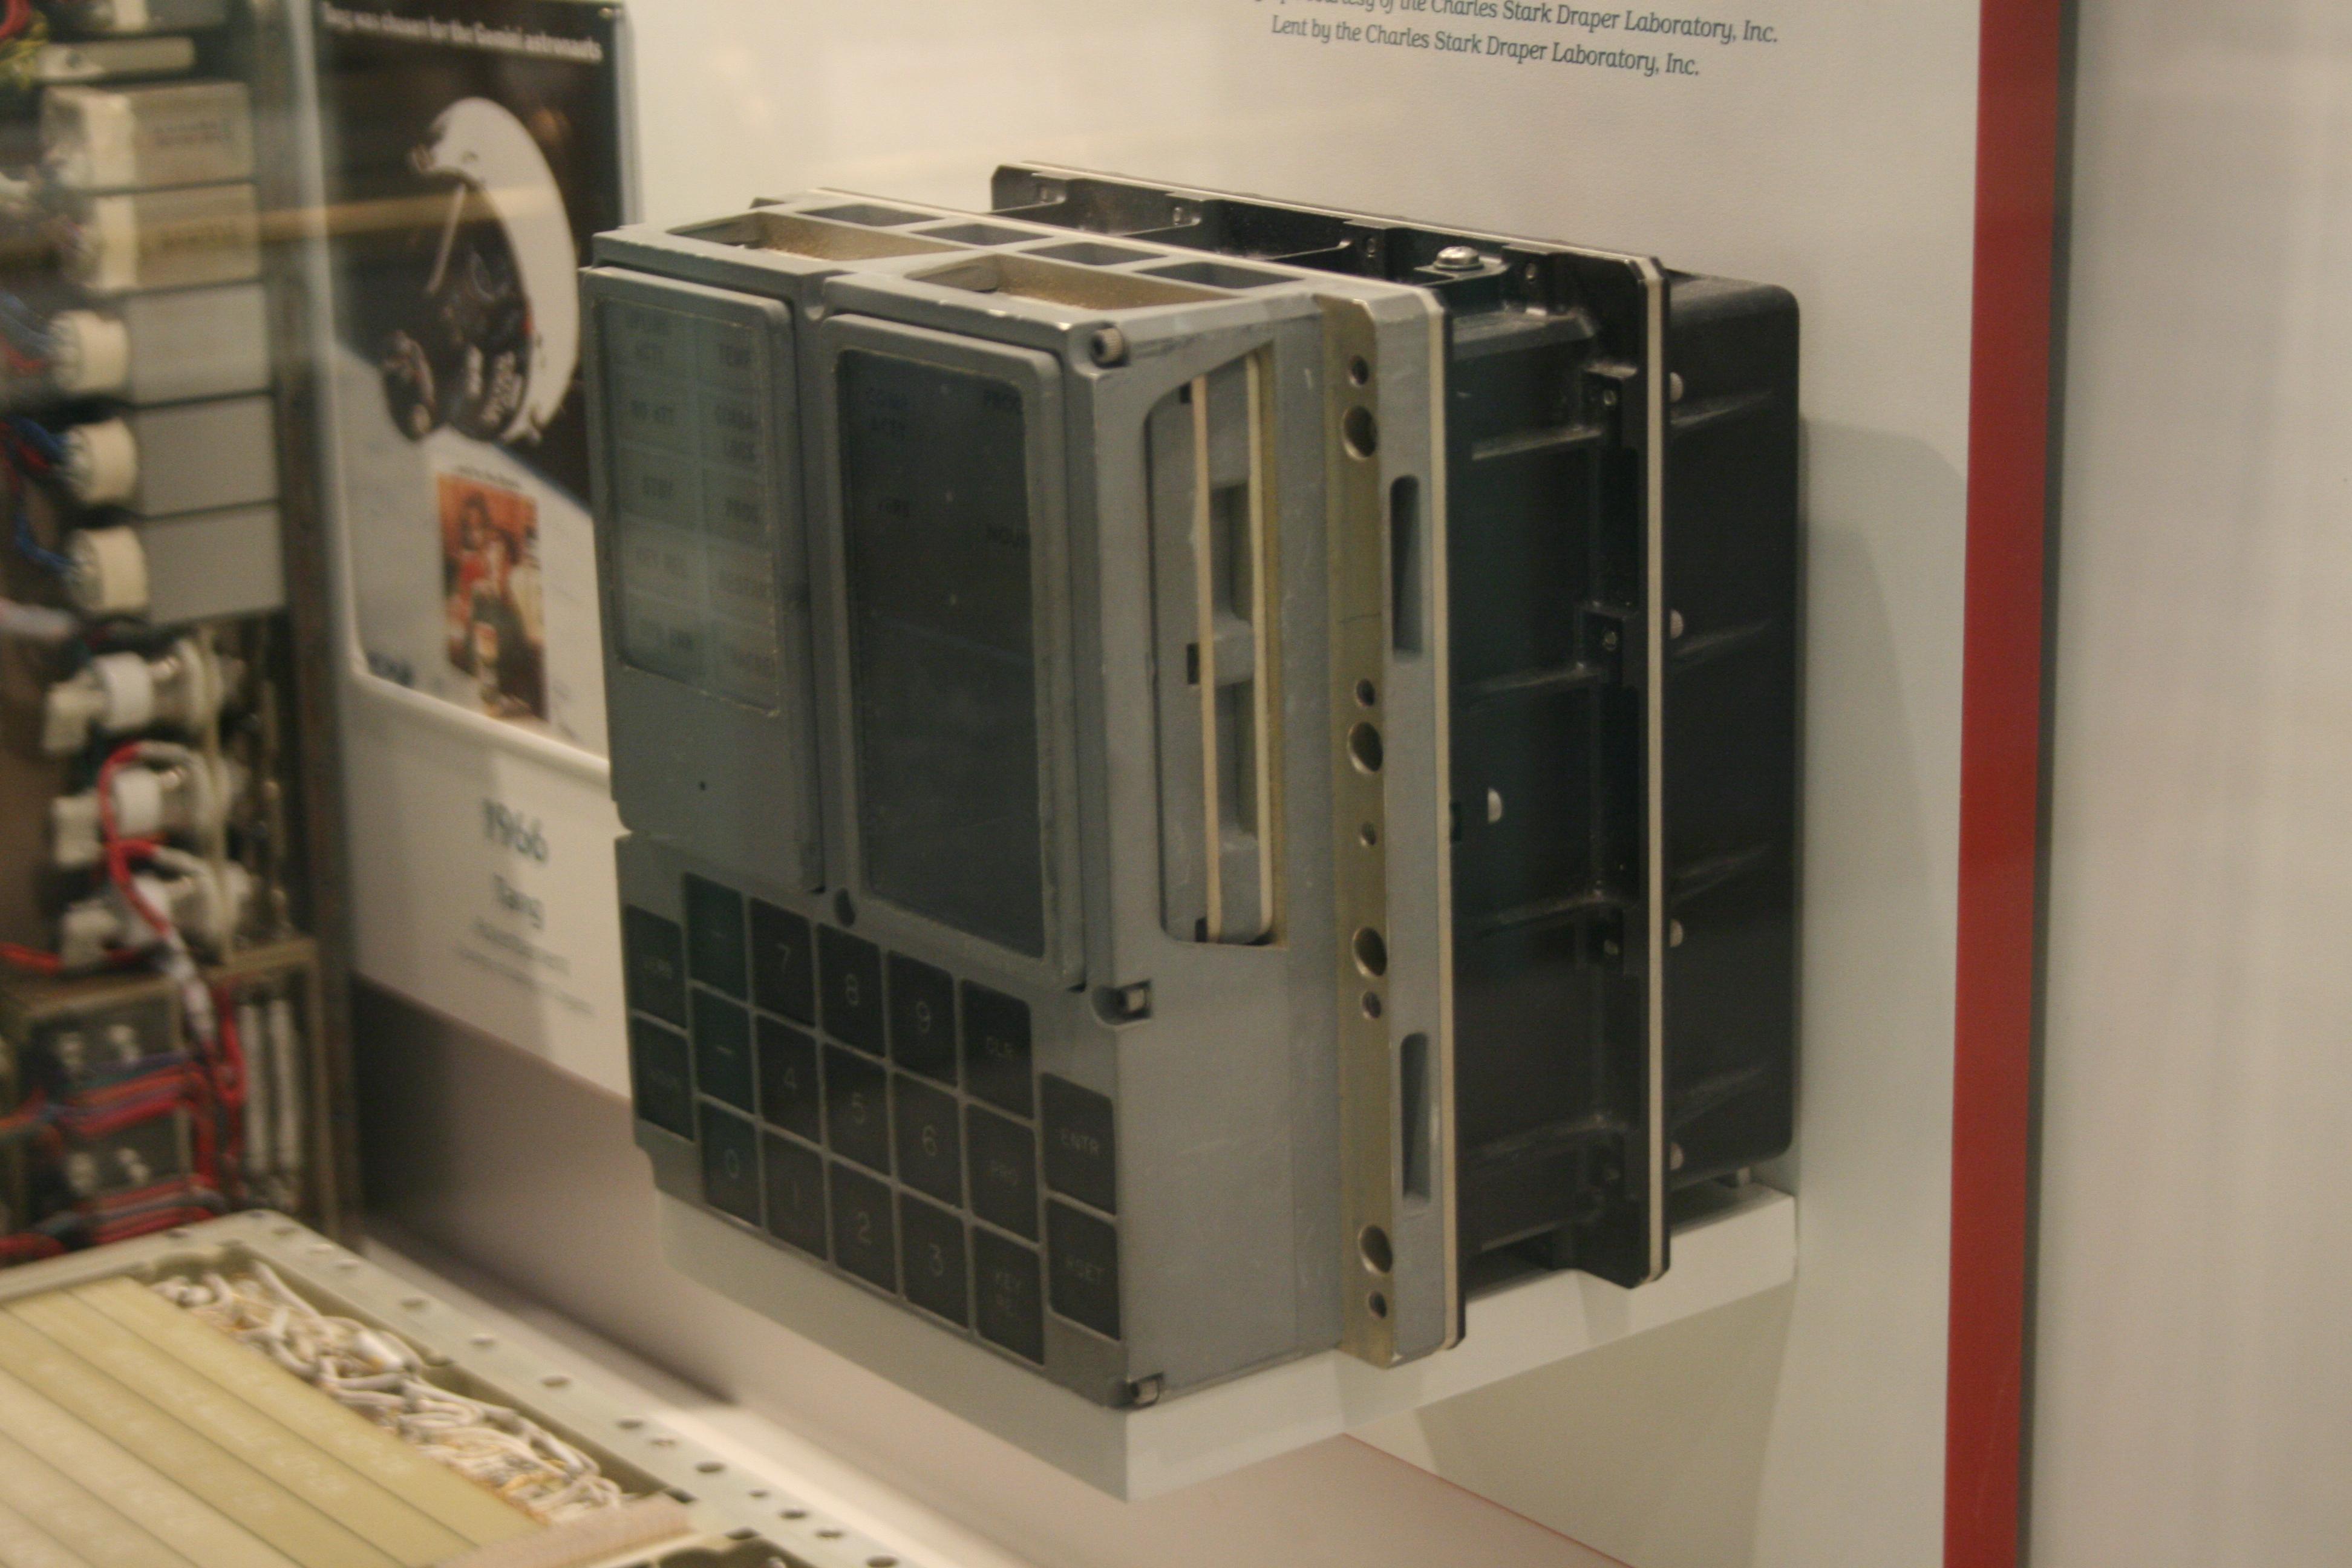 apollo spacecraft computer - photo #7